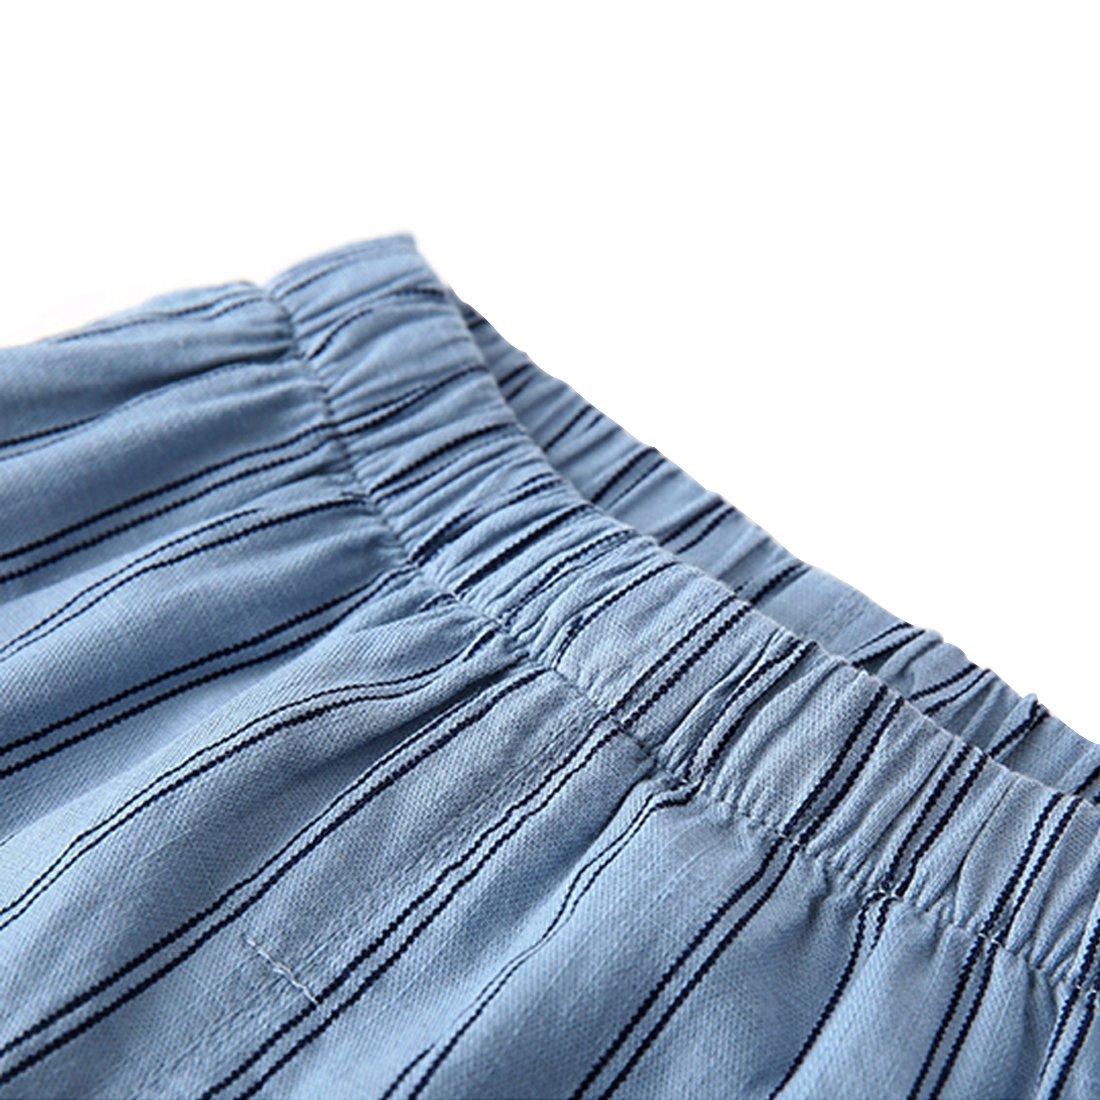 PAUBOLI Boys Button Down Pajamas Set Short Sleeve Organic Cotton Striped Sleepwear Loungewear (6-7 Years) by PAUBOLI (Image #6)